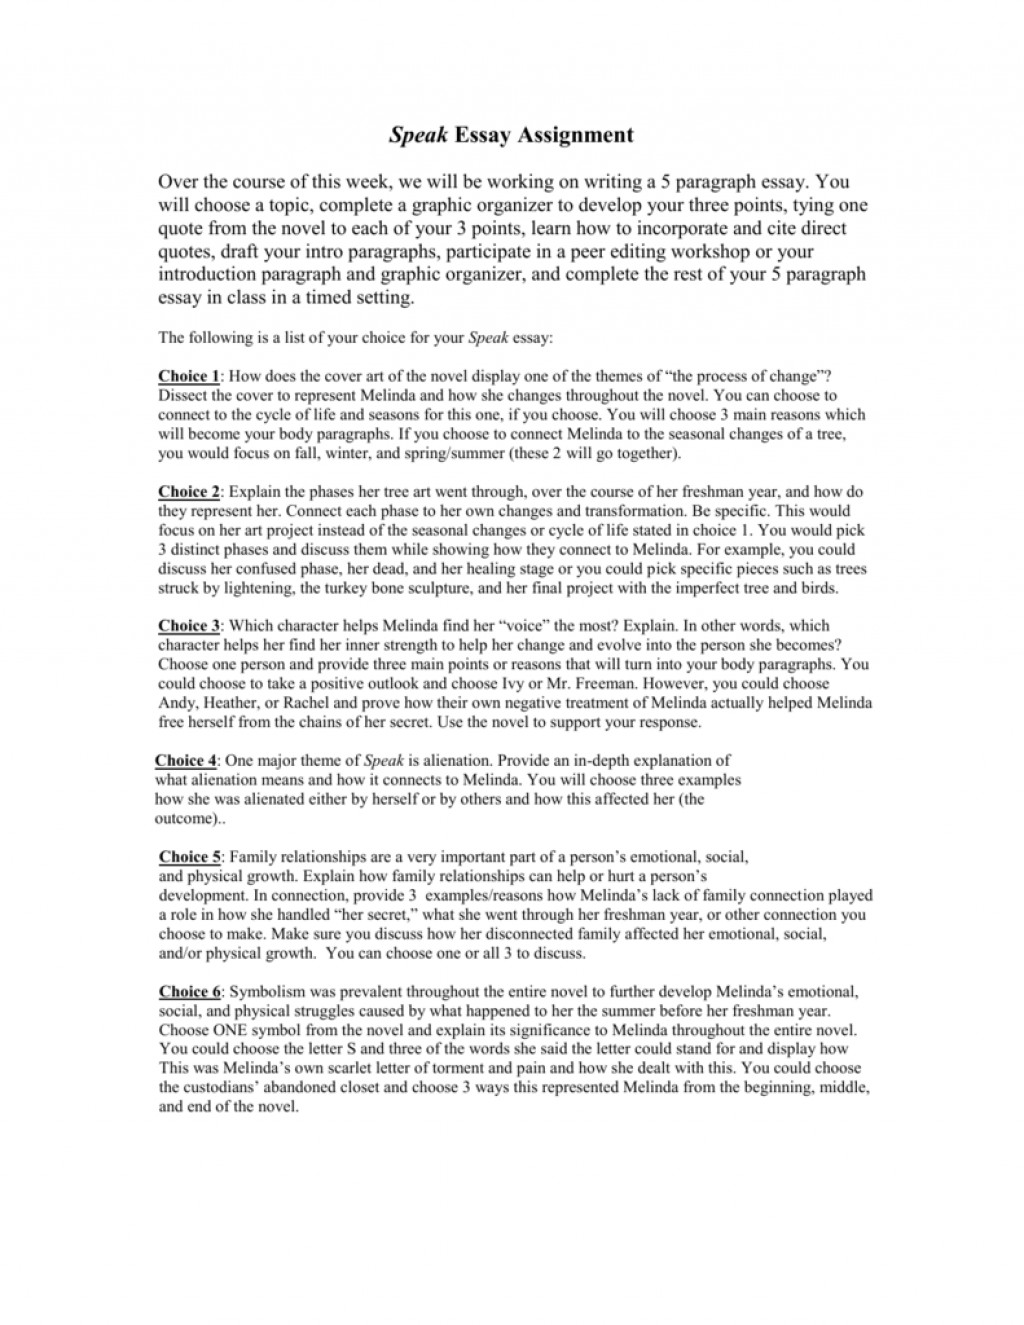 001 007876410 2 Essay Example Wonderful Speak Conclusion Thesis Titles Large